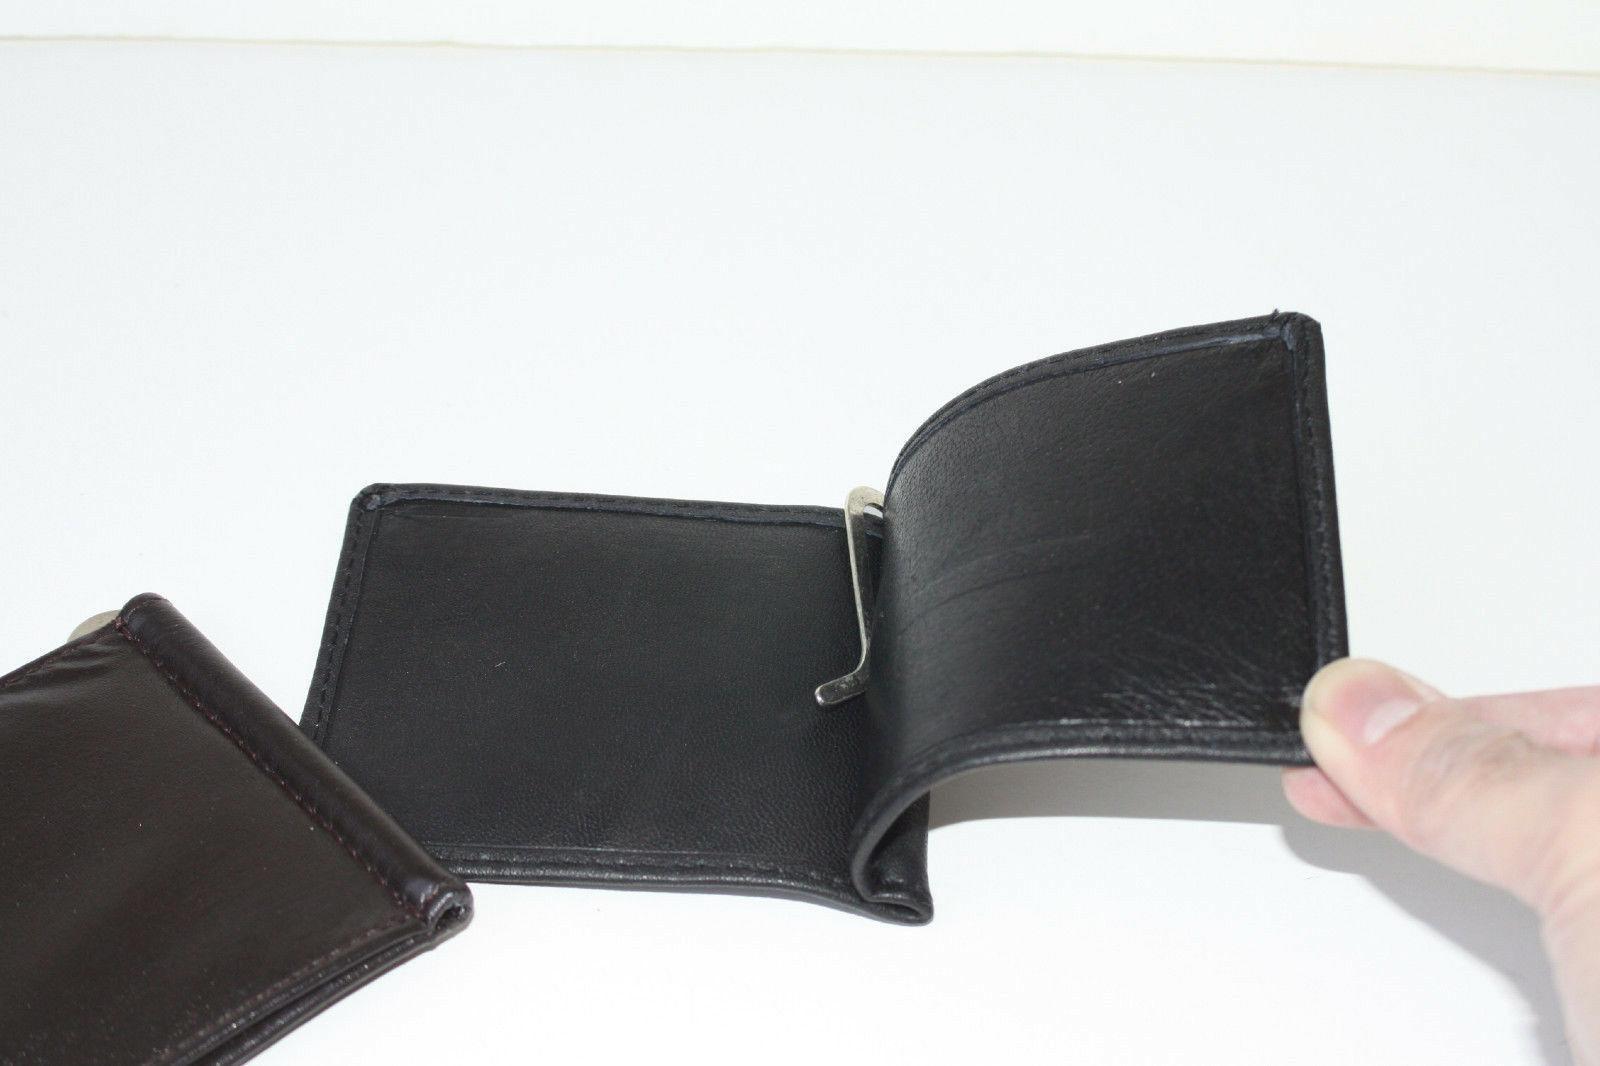 MEN'S MONEY CLIP USA Seller